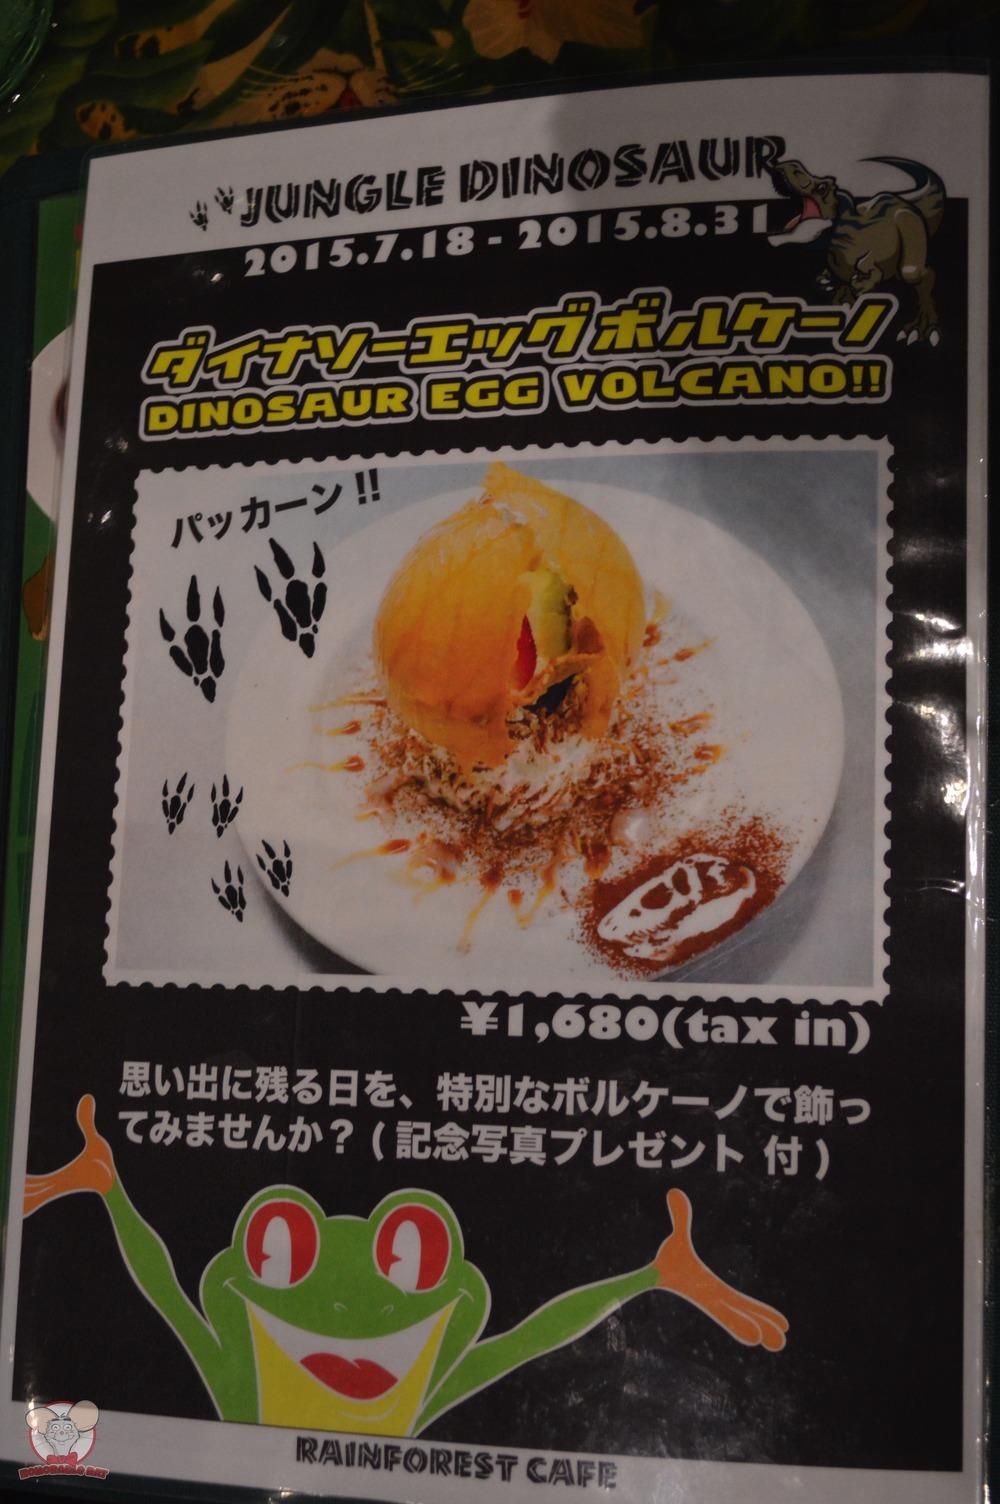 Dinosaur Egg Volcano Special Menu